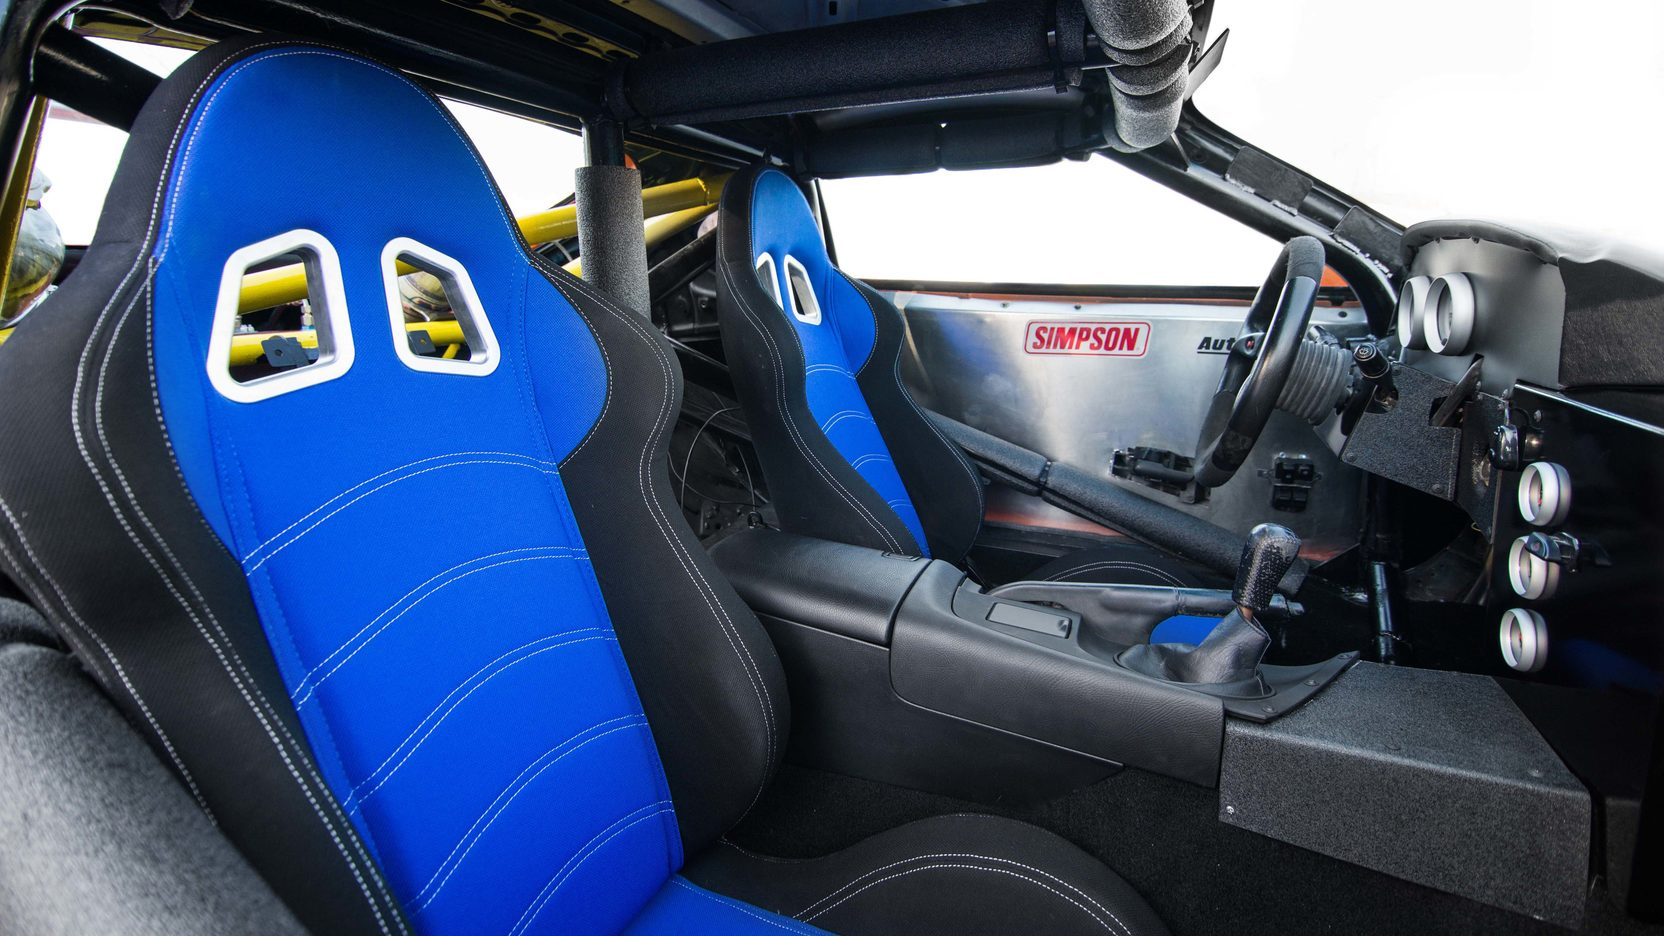 Легендарную Toyota Supra из Форсажа продали за $185 тысяч